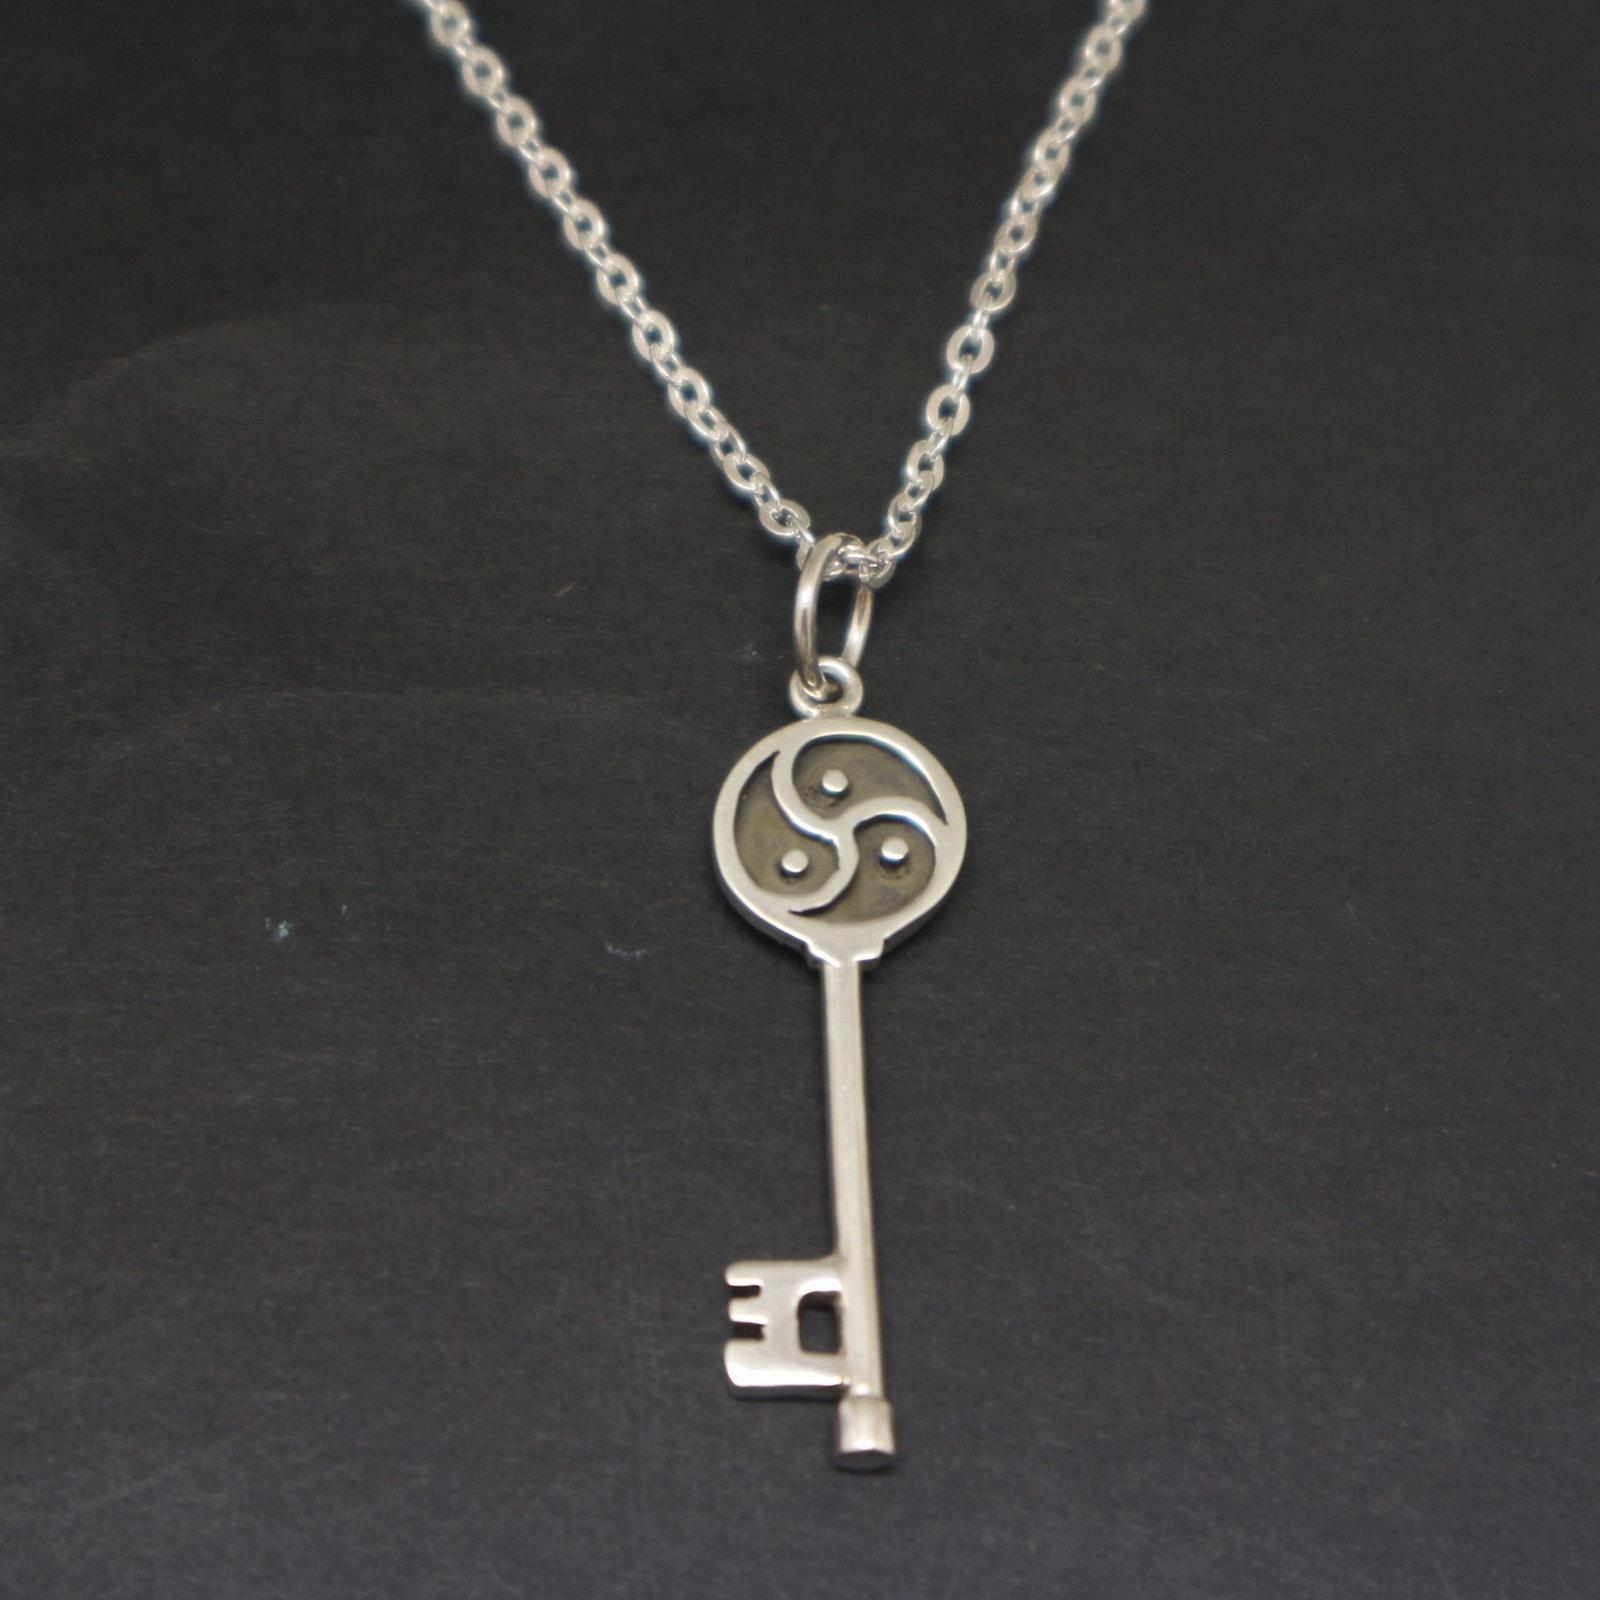 Silver BDSM Key Necklace Pendant